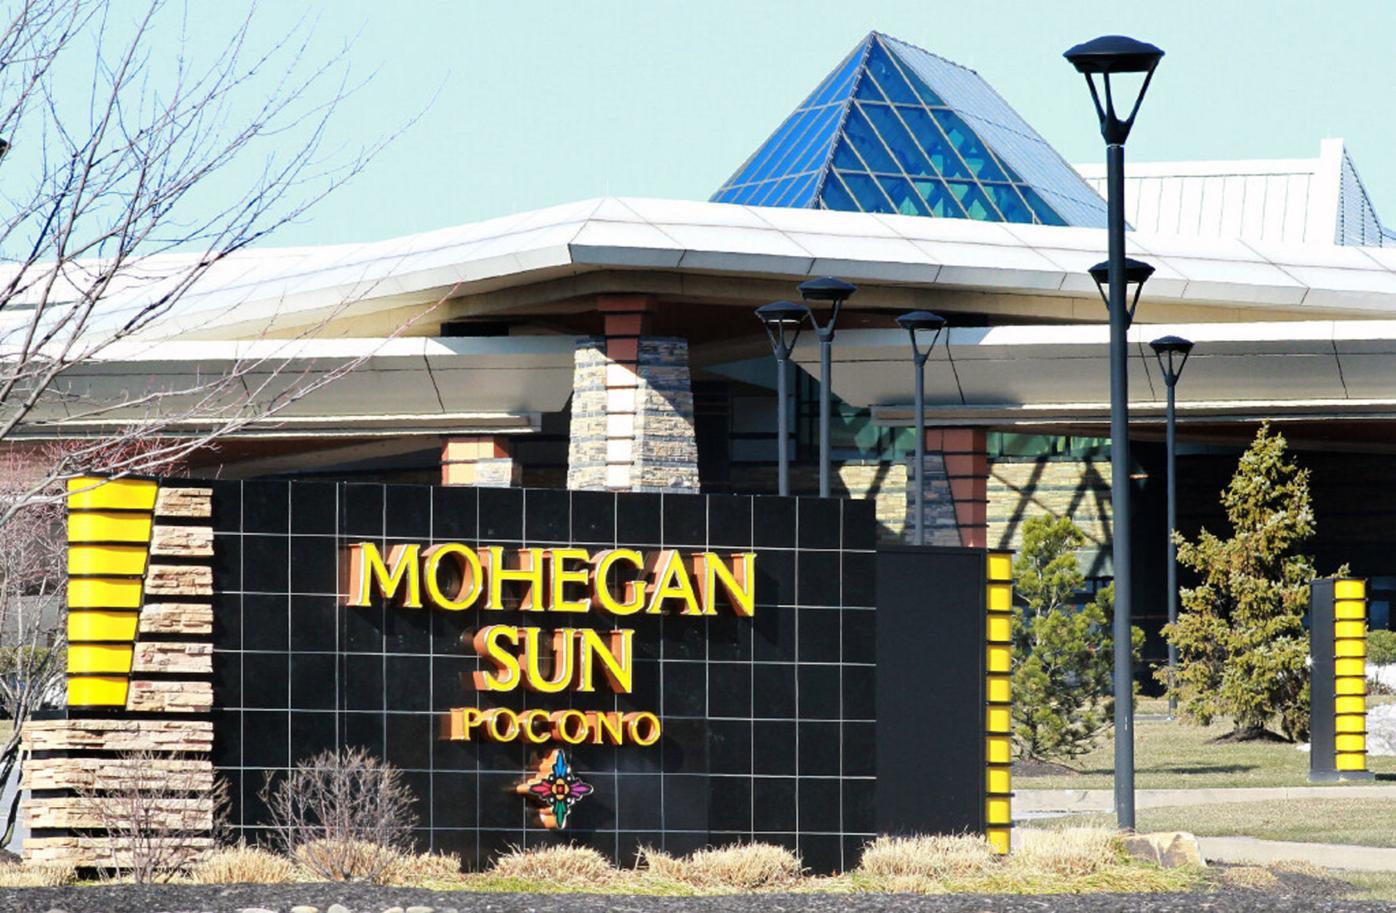 Mohegan sun casino wilkes barre pa poker tournament schedule printable